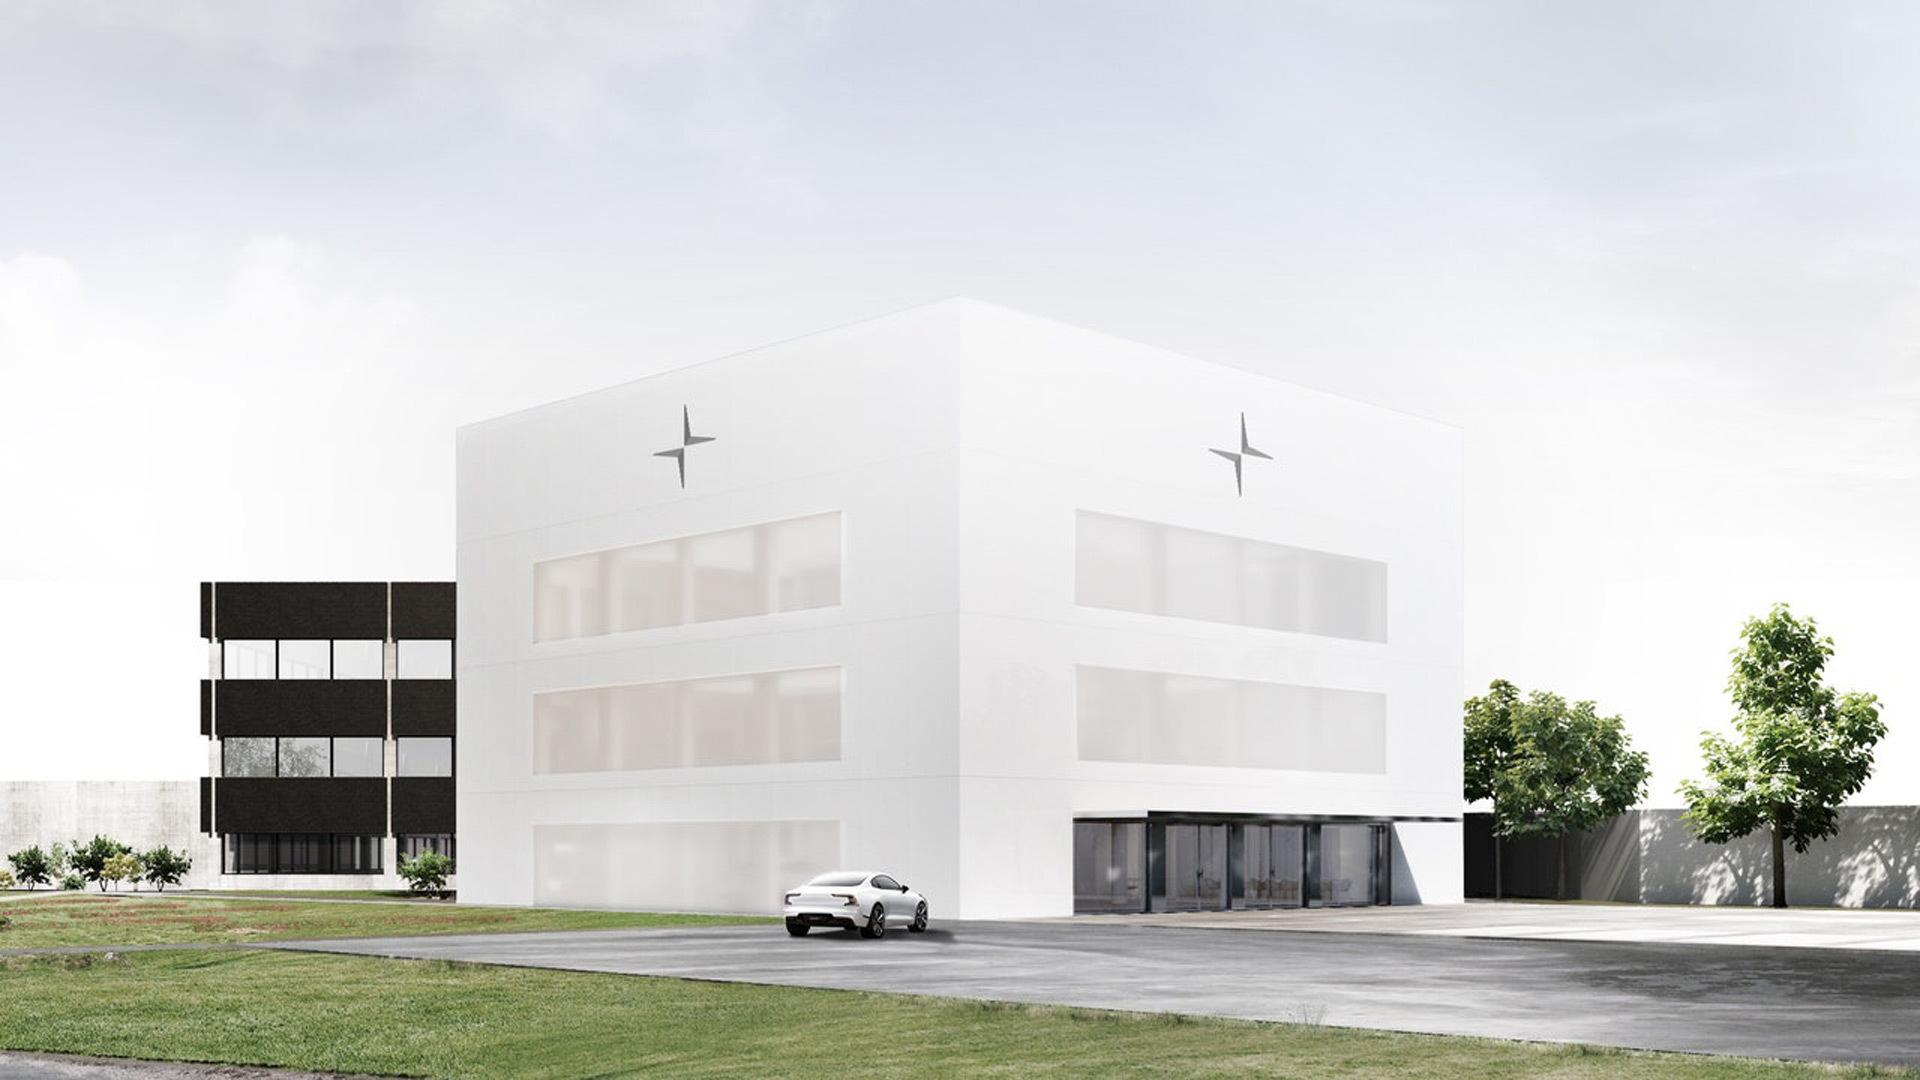 Artist's impression of Polestar's headquarters under construction in Torslanda, Sweden